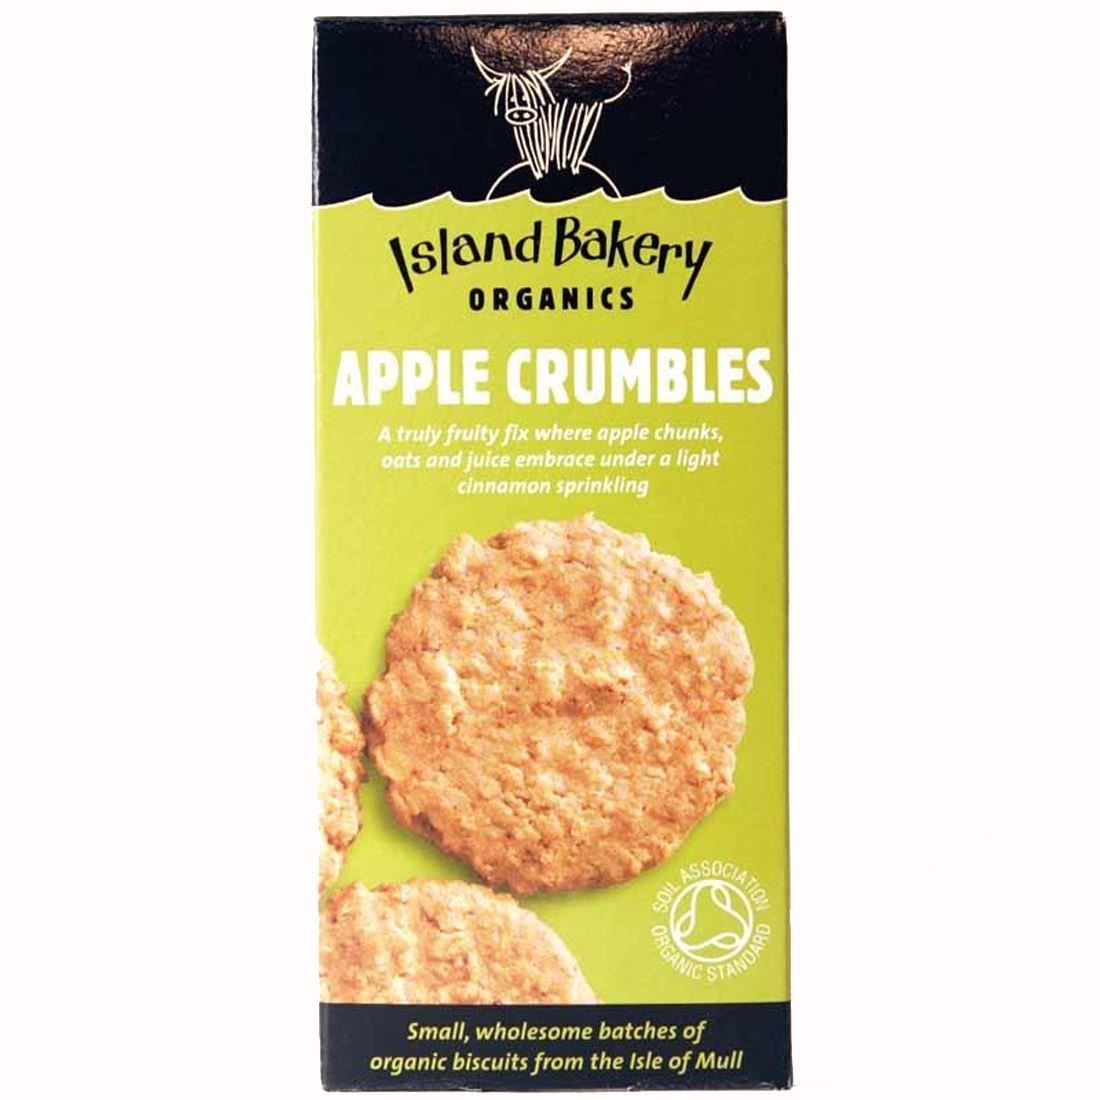 Island Bakery Organics | Apple Crumbles Organic Biscuit | 5 x 150g